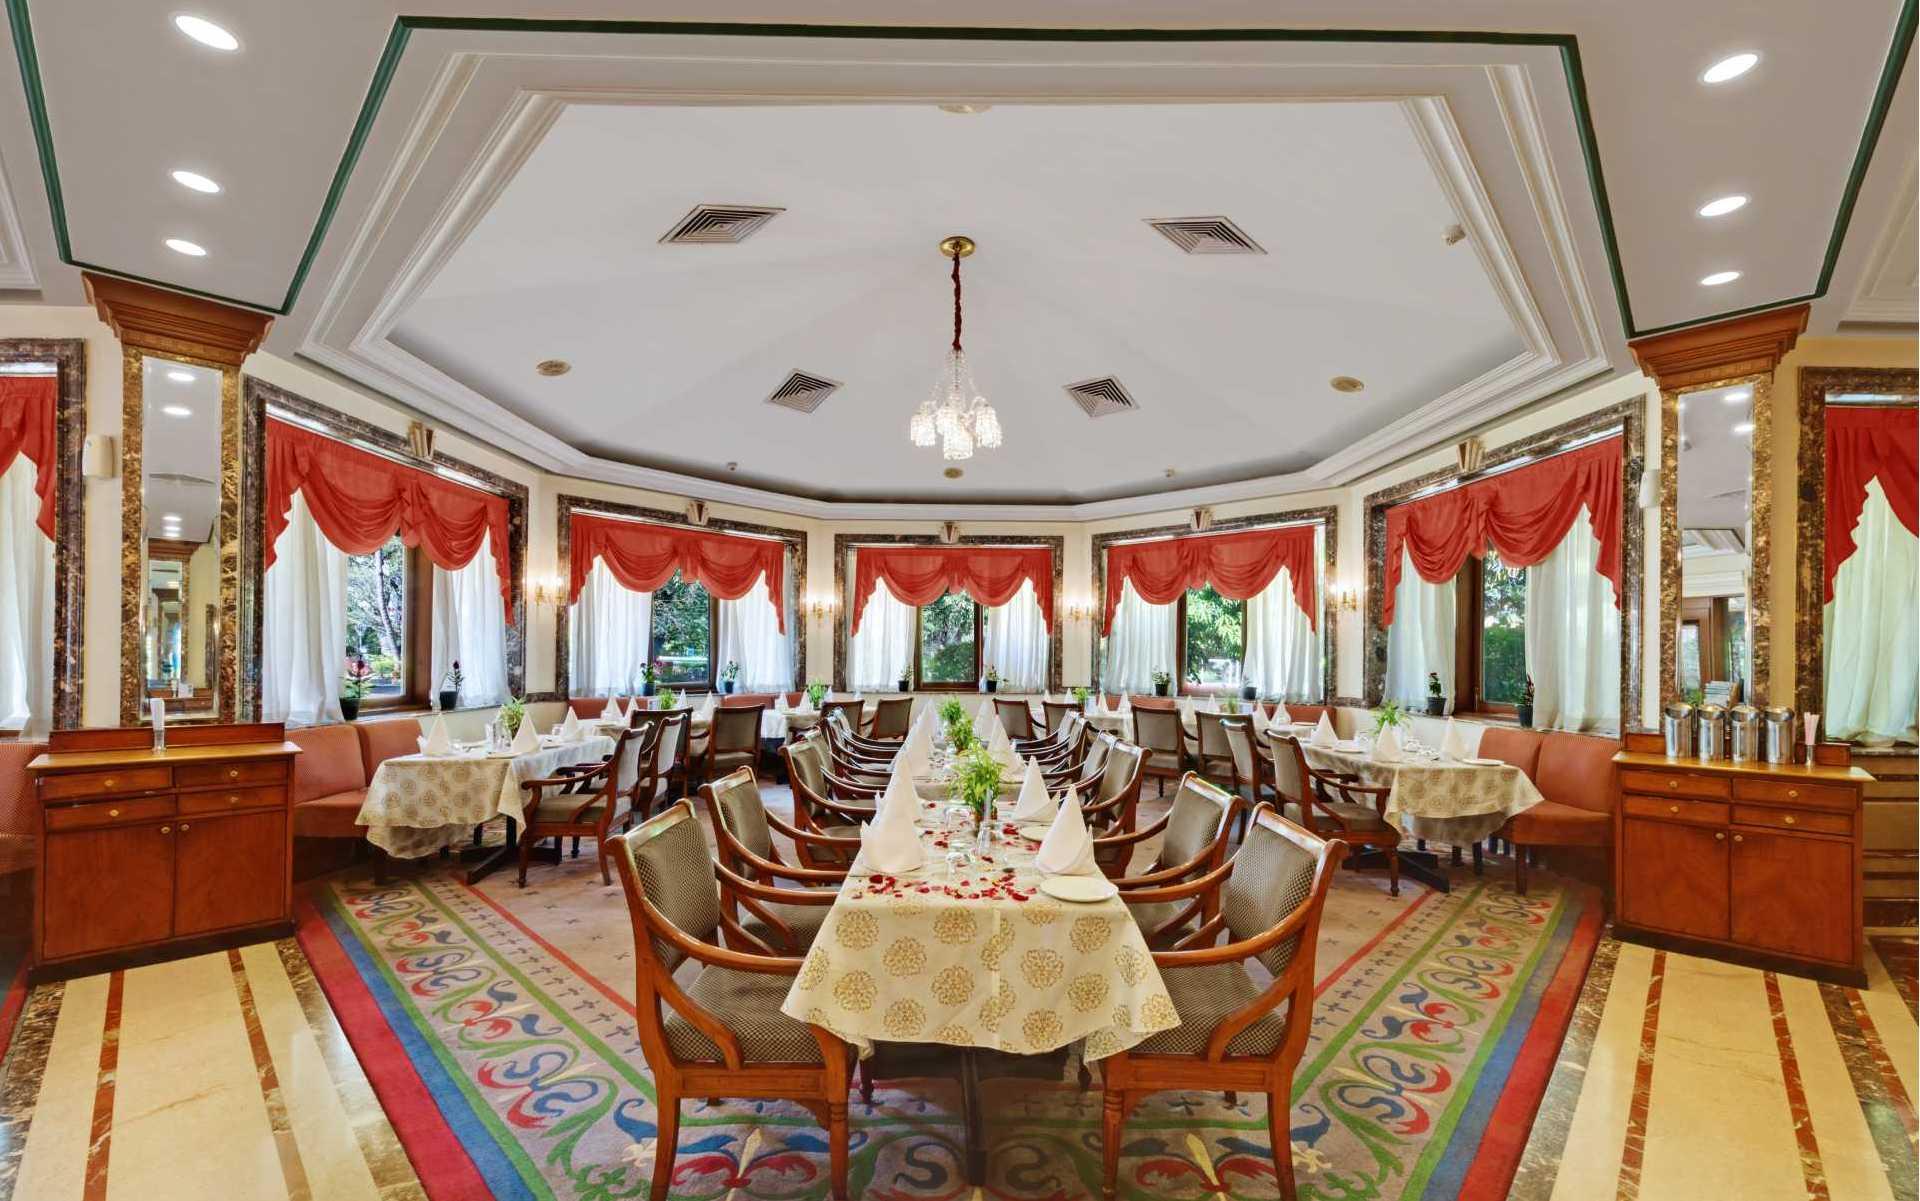 Society Restaurant Ambassador Ajanta Aurangabad Dining 2 - The Ambassador | Heritage Hotels in Mumbai, Aurangabad, Chennai - The Society Restaurant